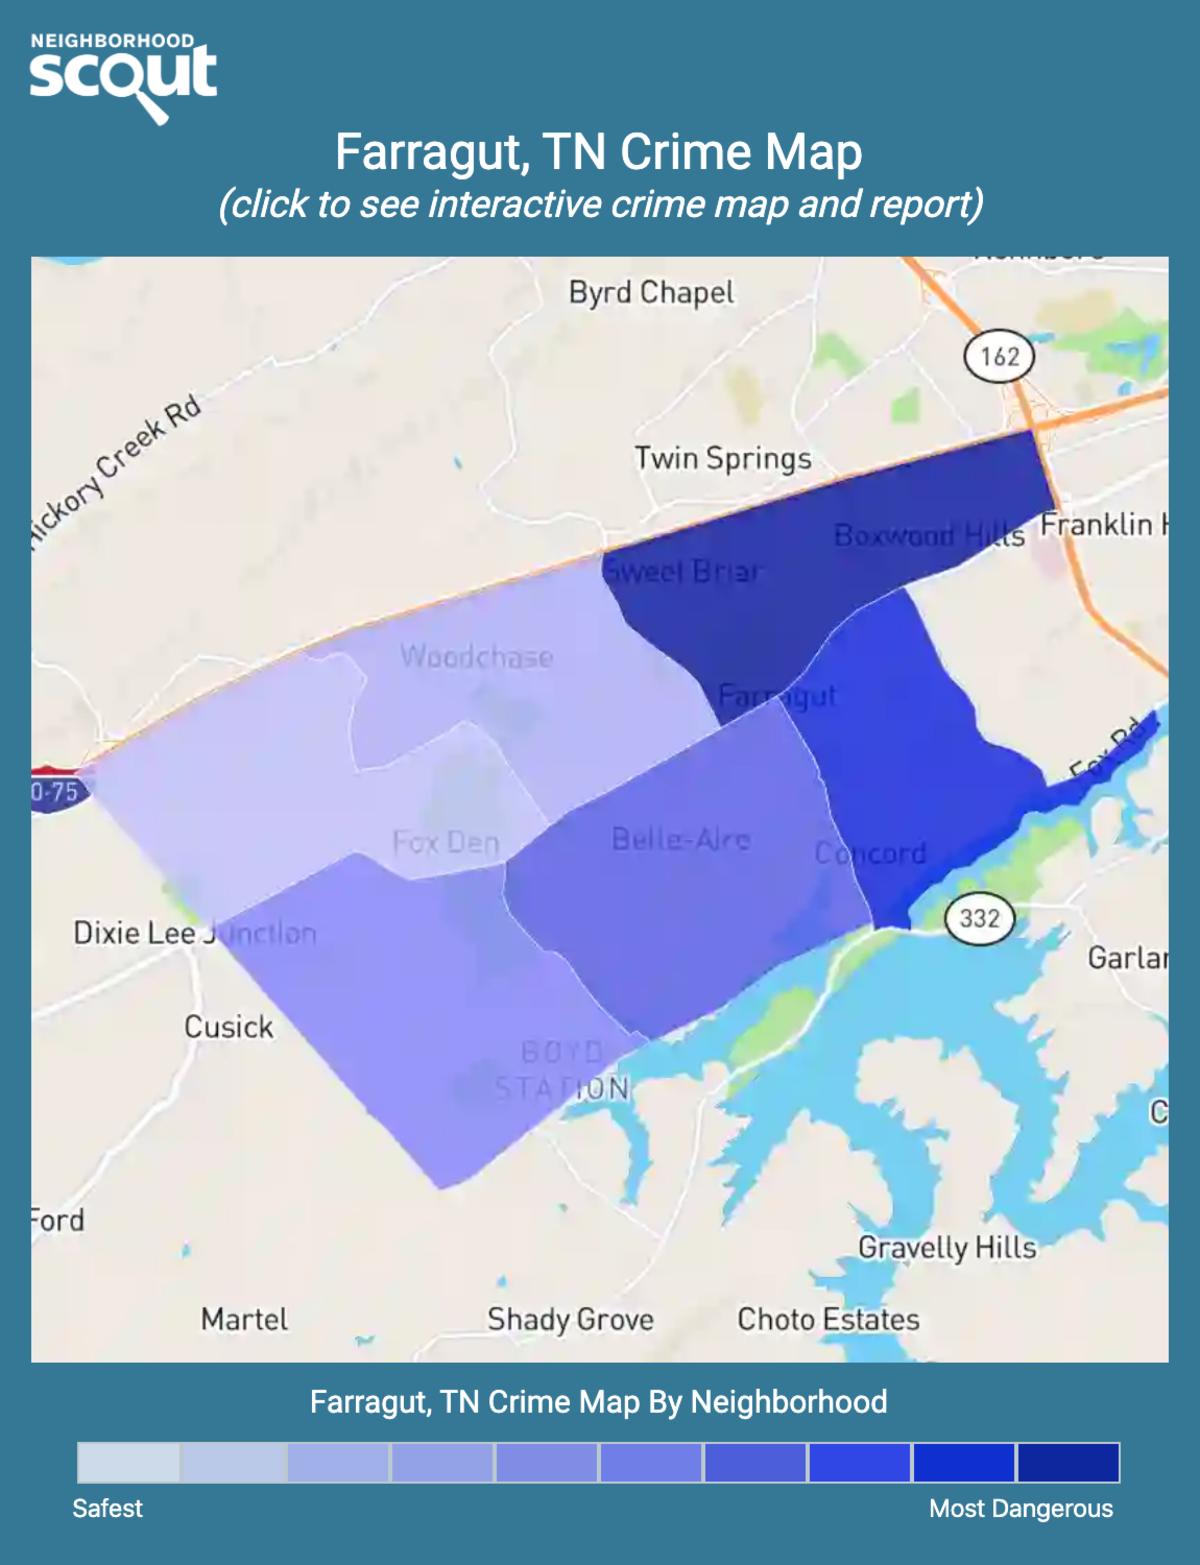 Farragut, Tennessee crime map